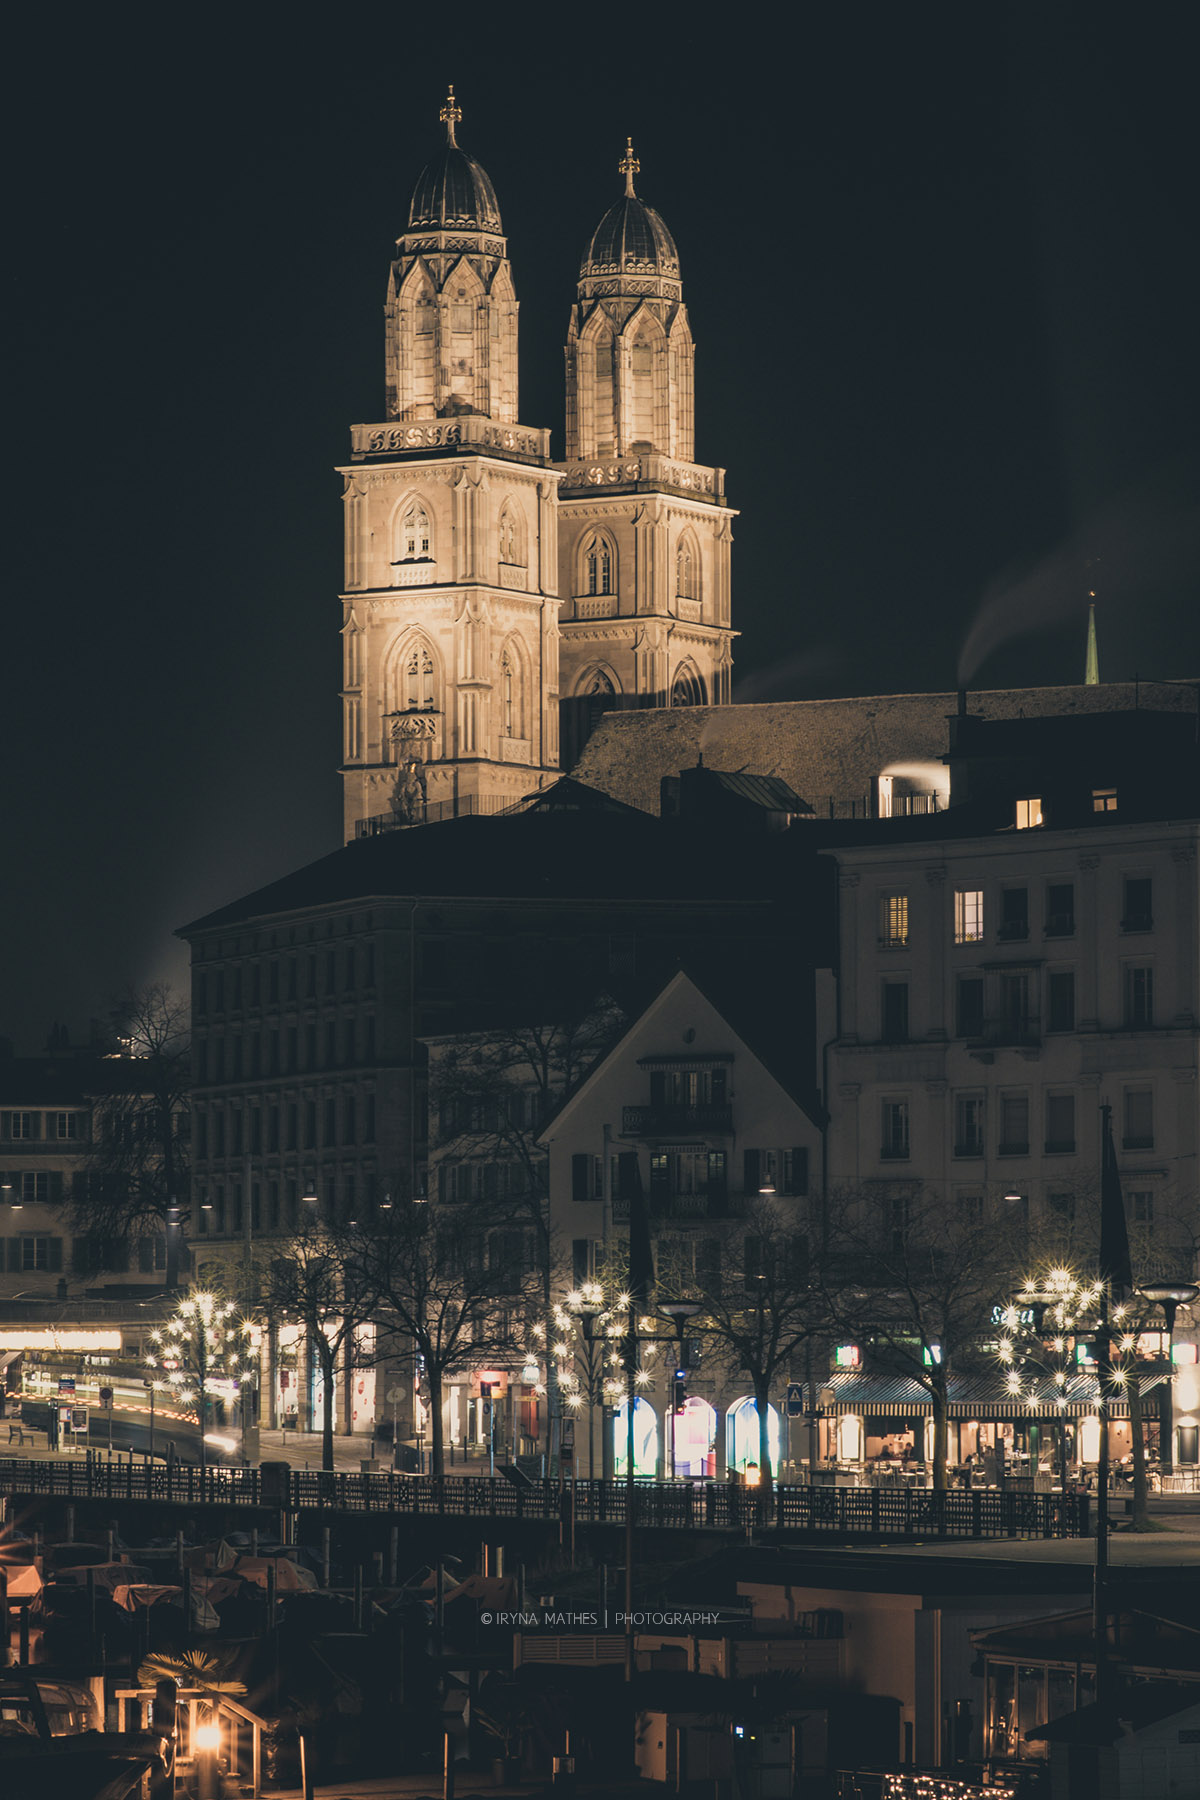 Zürich. Grossmünster Kirche am Nacht. Reise Fotografie Iryna Mathes